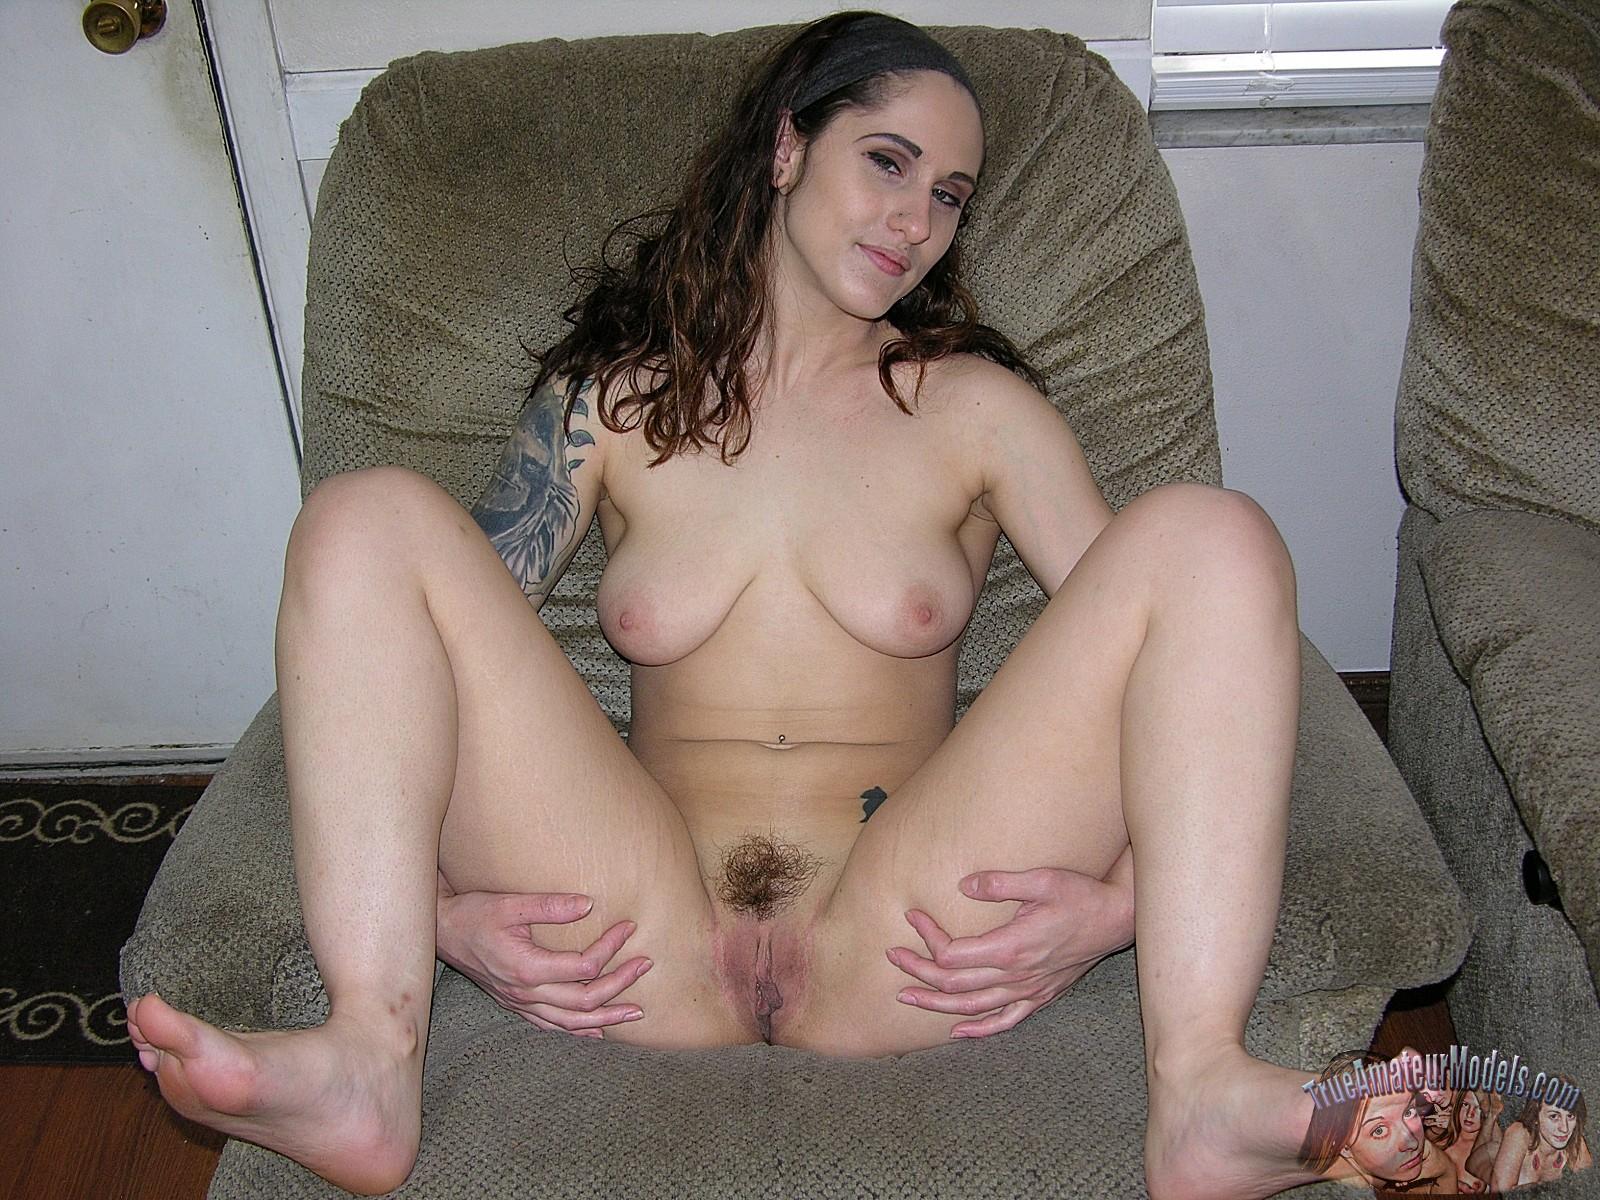 amateur nudes in puerto rico